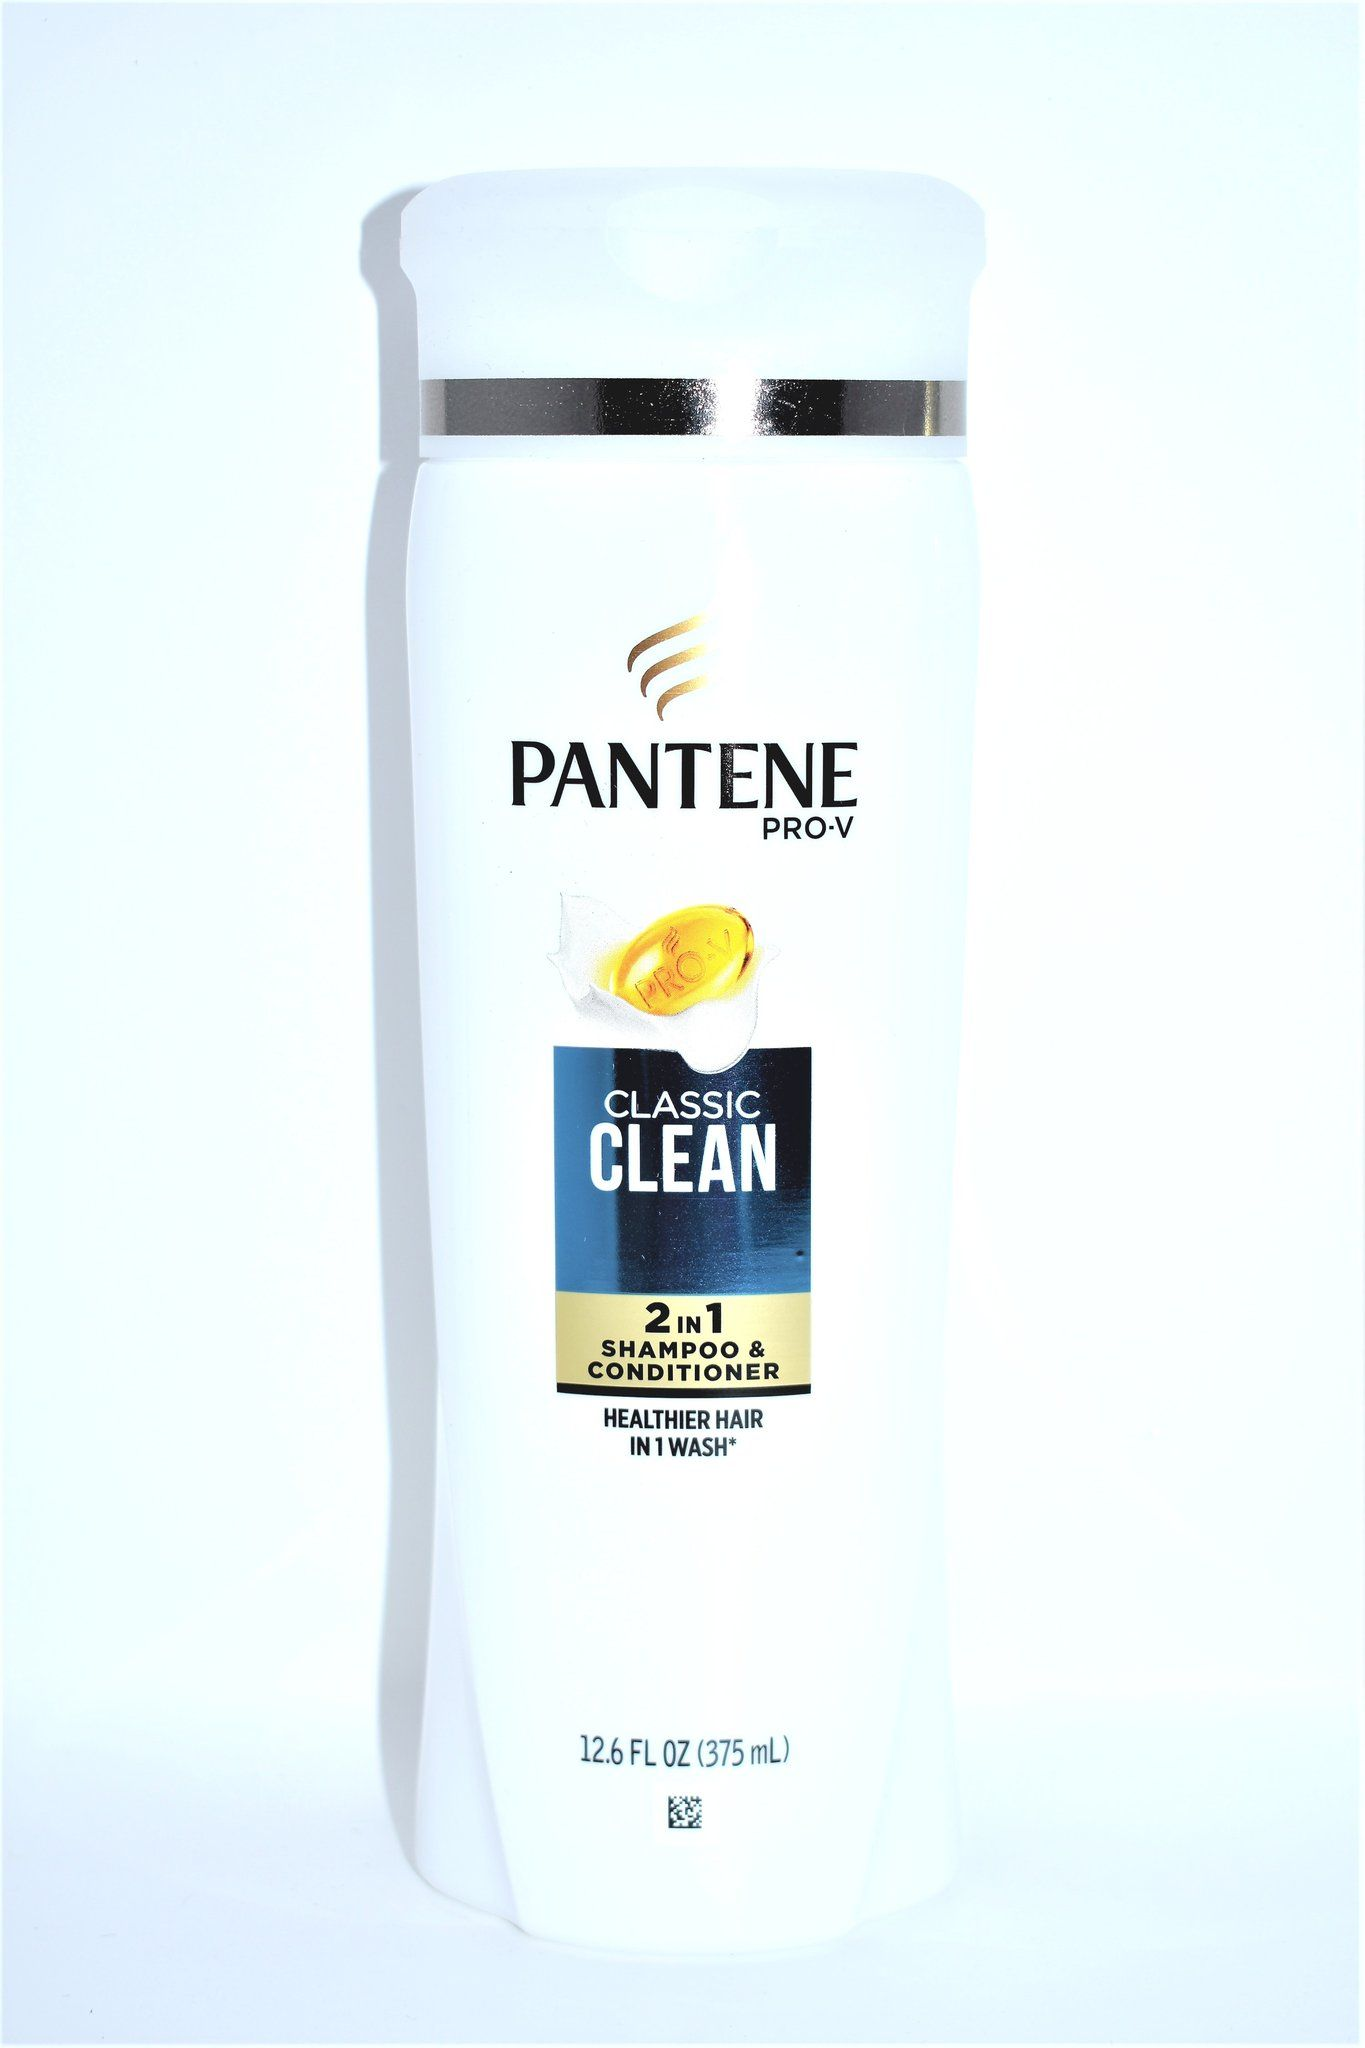 Pantene Pro V Classic Clean 2 In 1 Shampoo Conditioner 12 6 Fl Oz Shampoo And Conditioner Shampoo Pantene